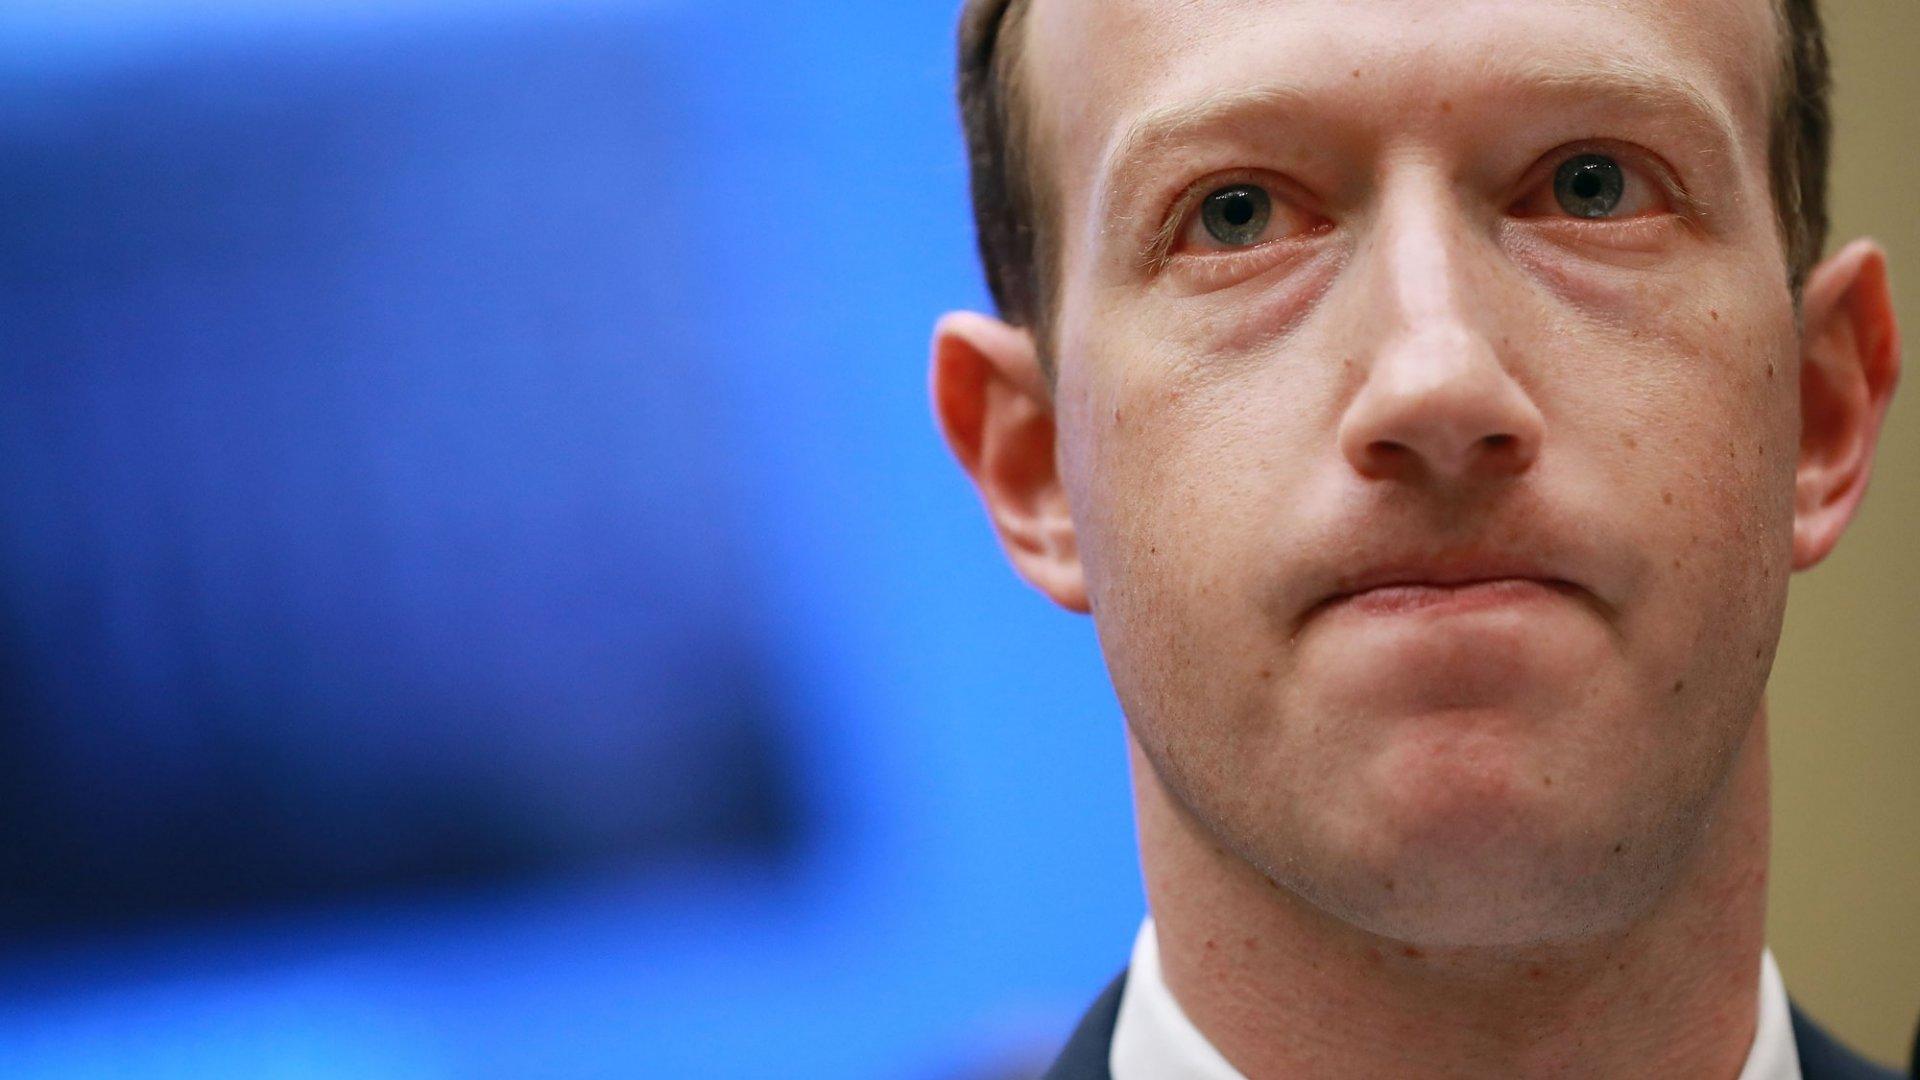 Investors Revolt Against Mark Zuckerberg at Facebook's Annual Shareholder Meeting